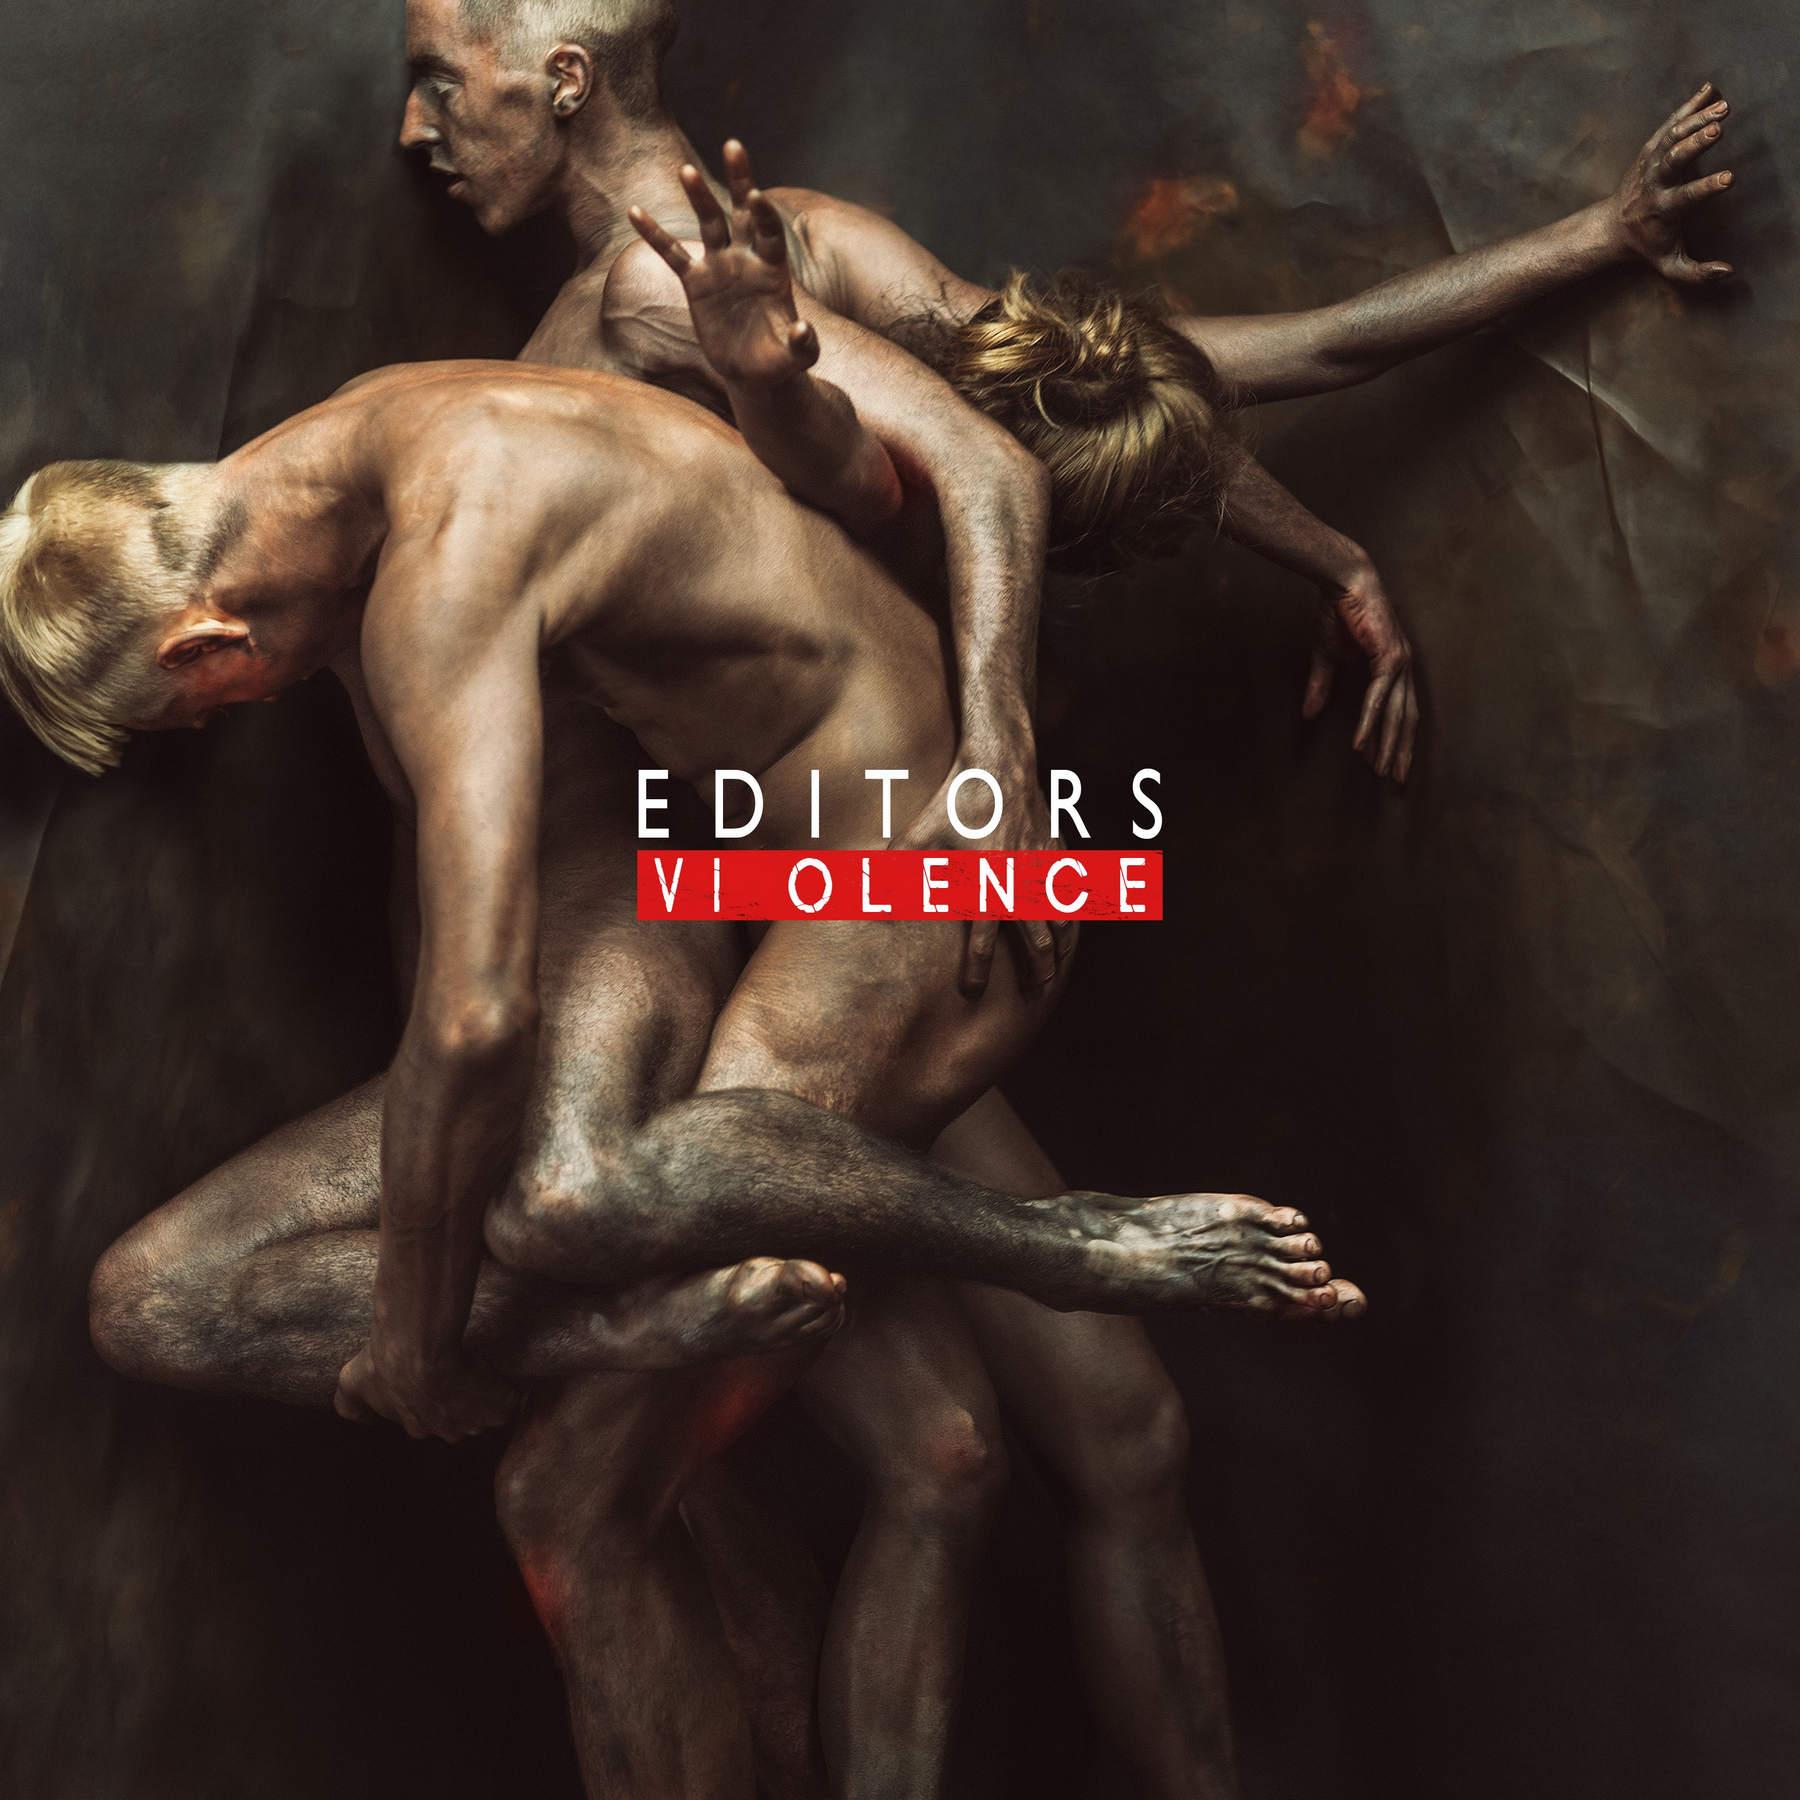 Editors: Violence (2018) Book Cover